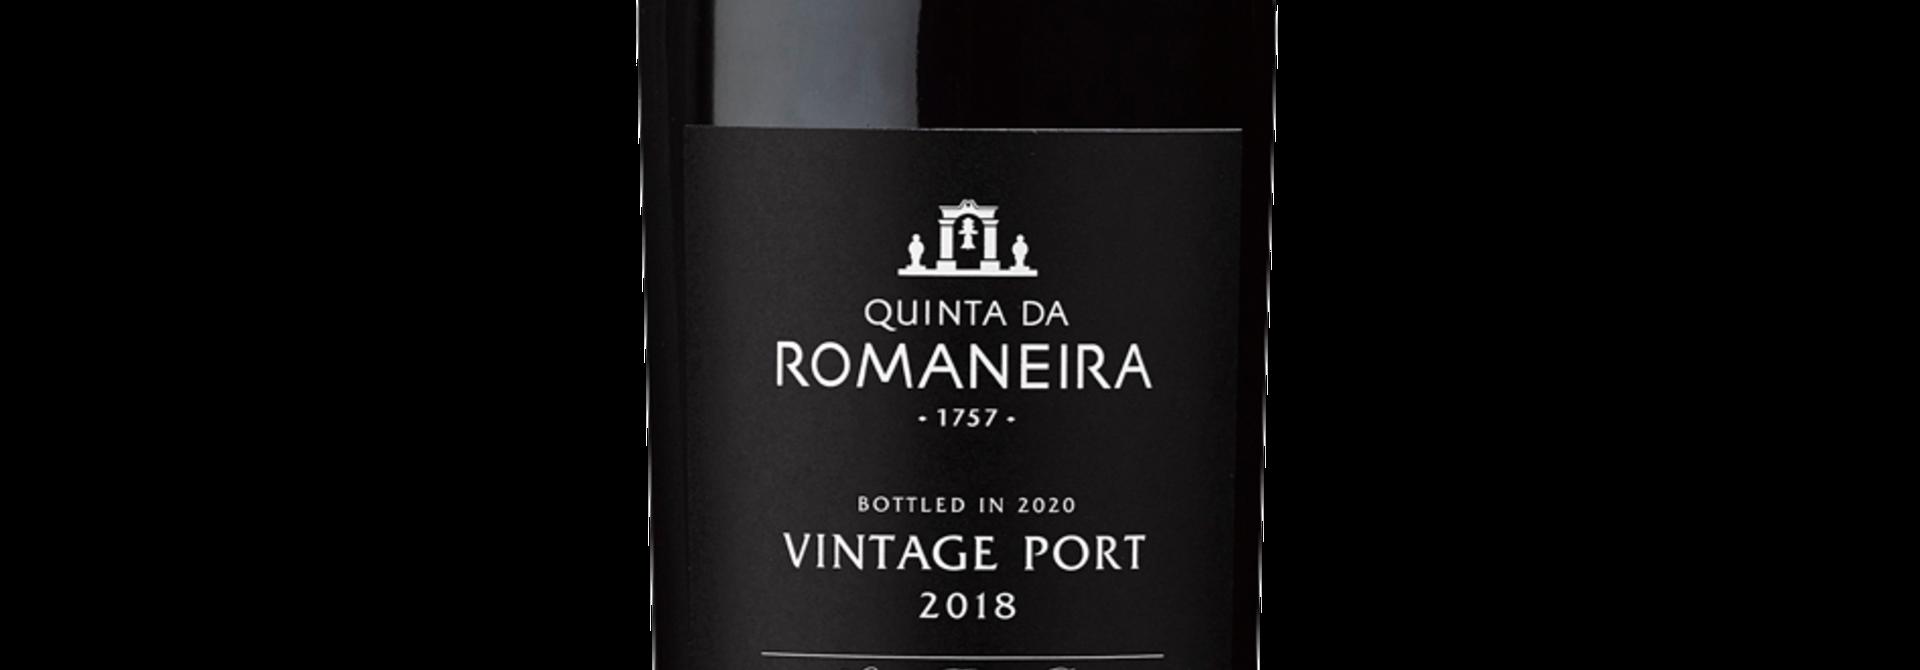 Quinta da Romaneira Vintage Port 2018